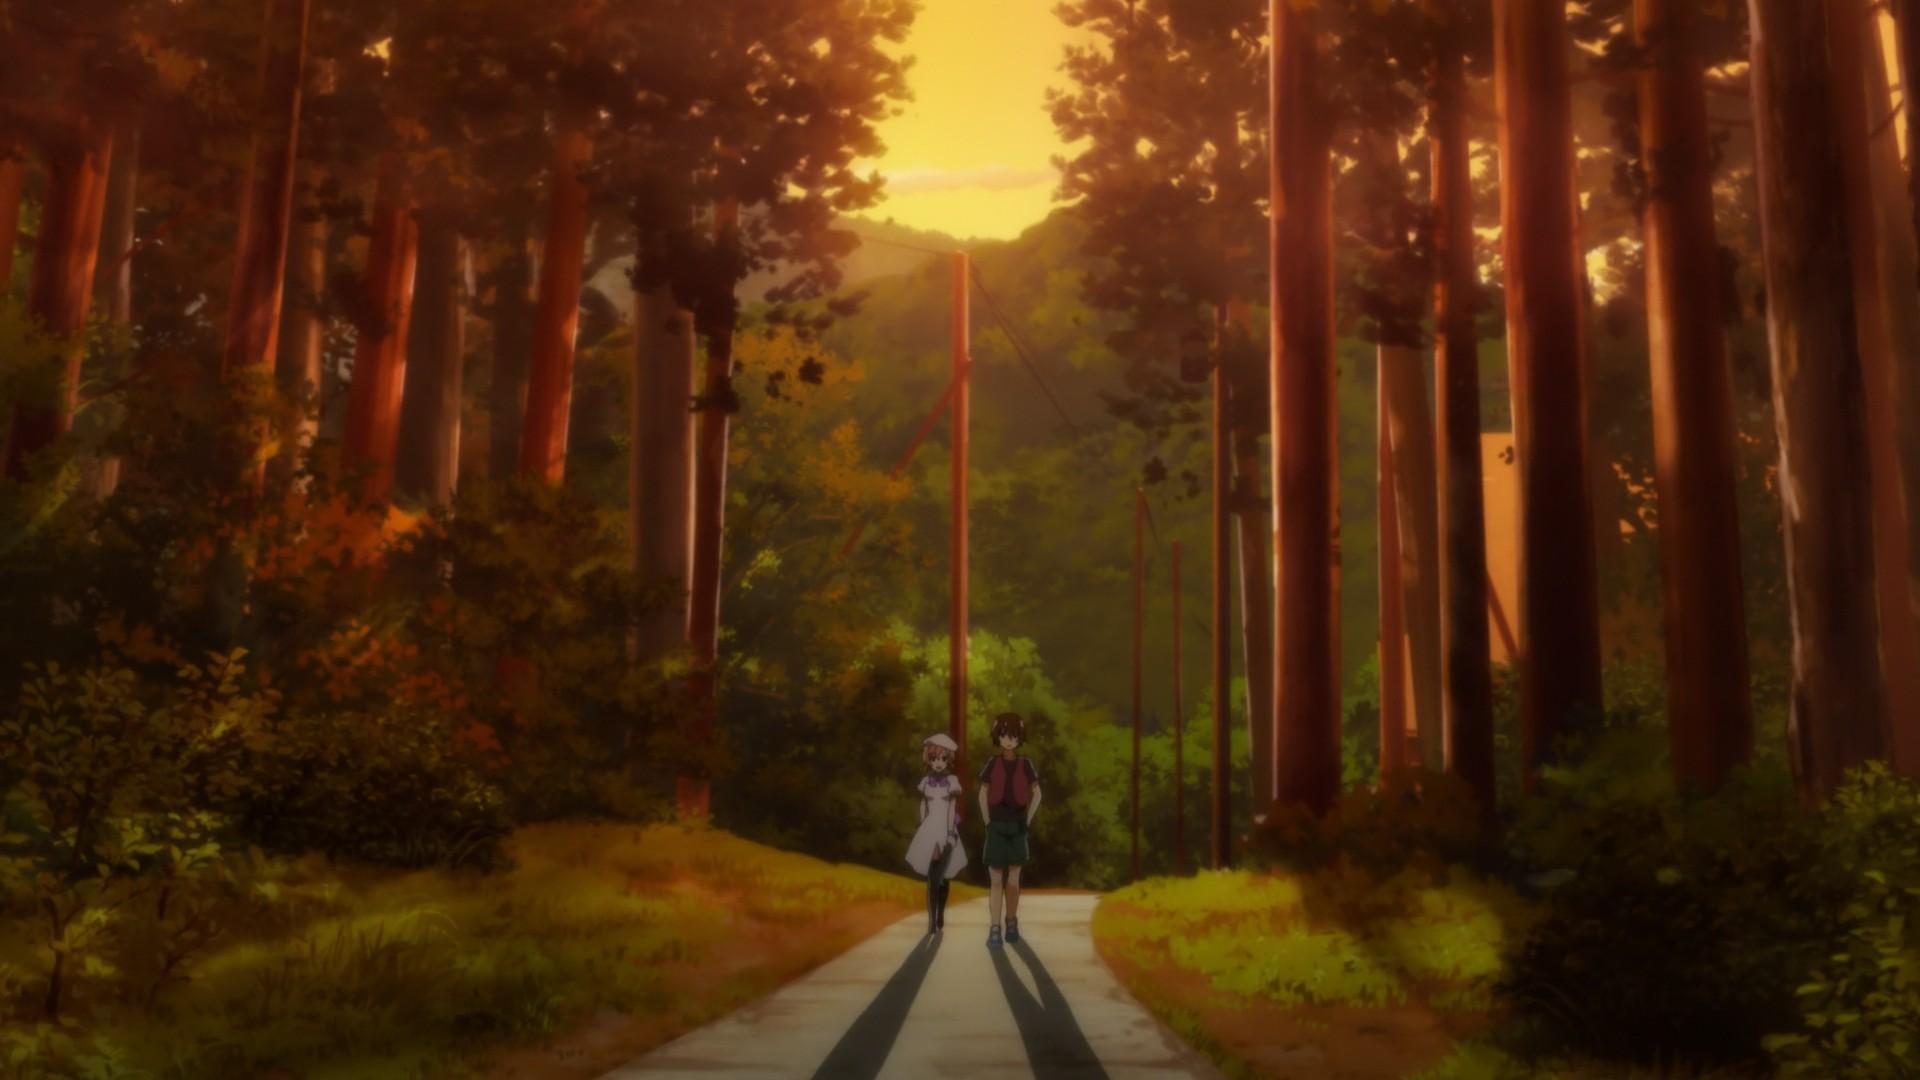 Najlepiej wyglądające anime 2020 - Higurashi no Naku koro Ni Gou